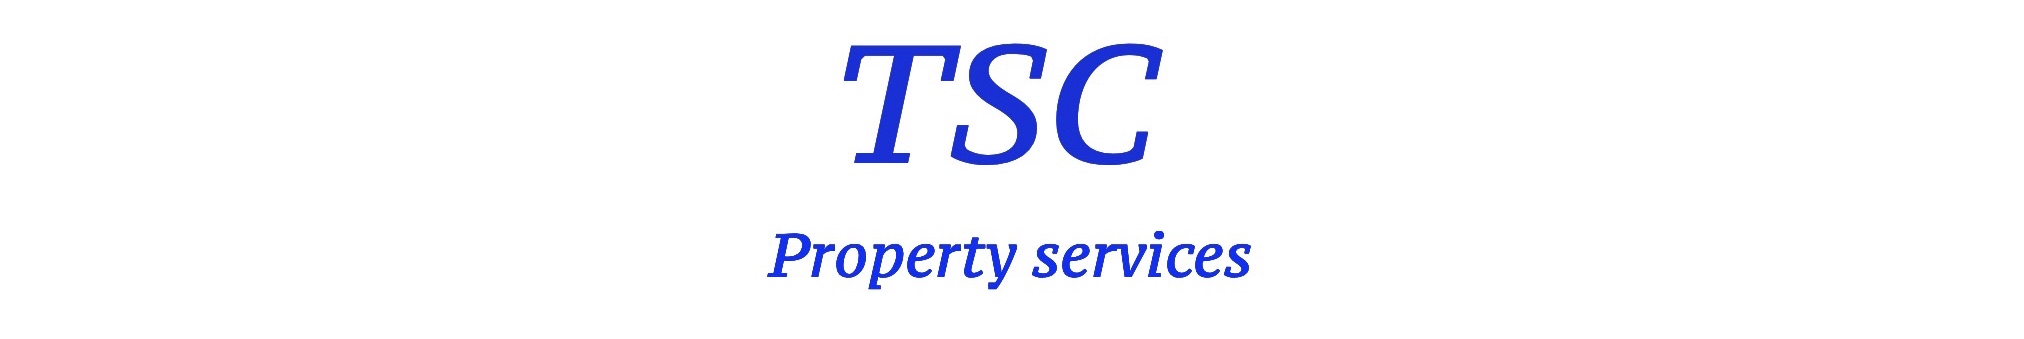 TSC Property Services Verified Logo